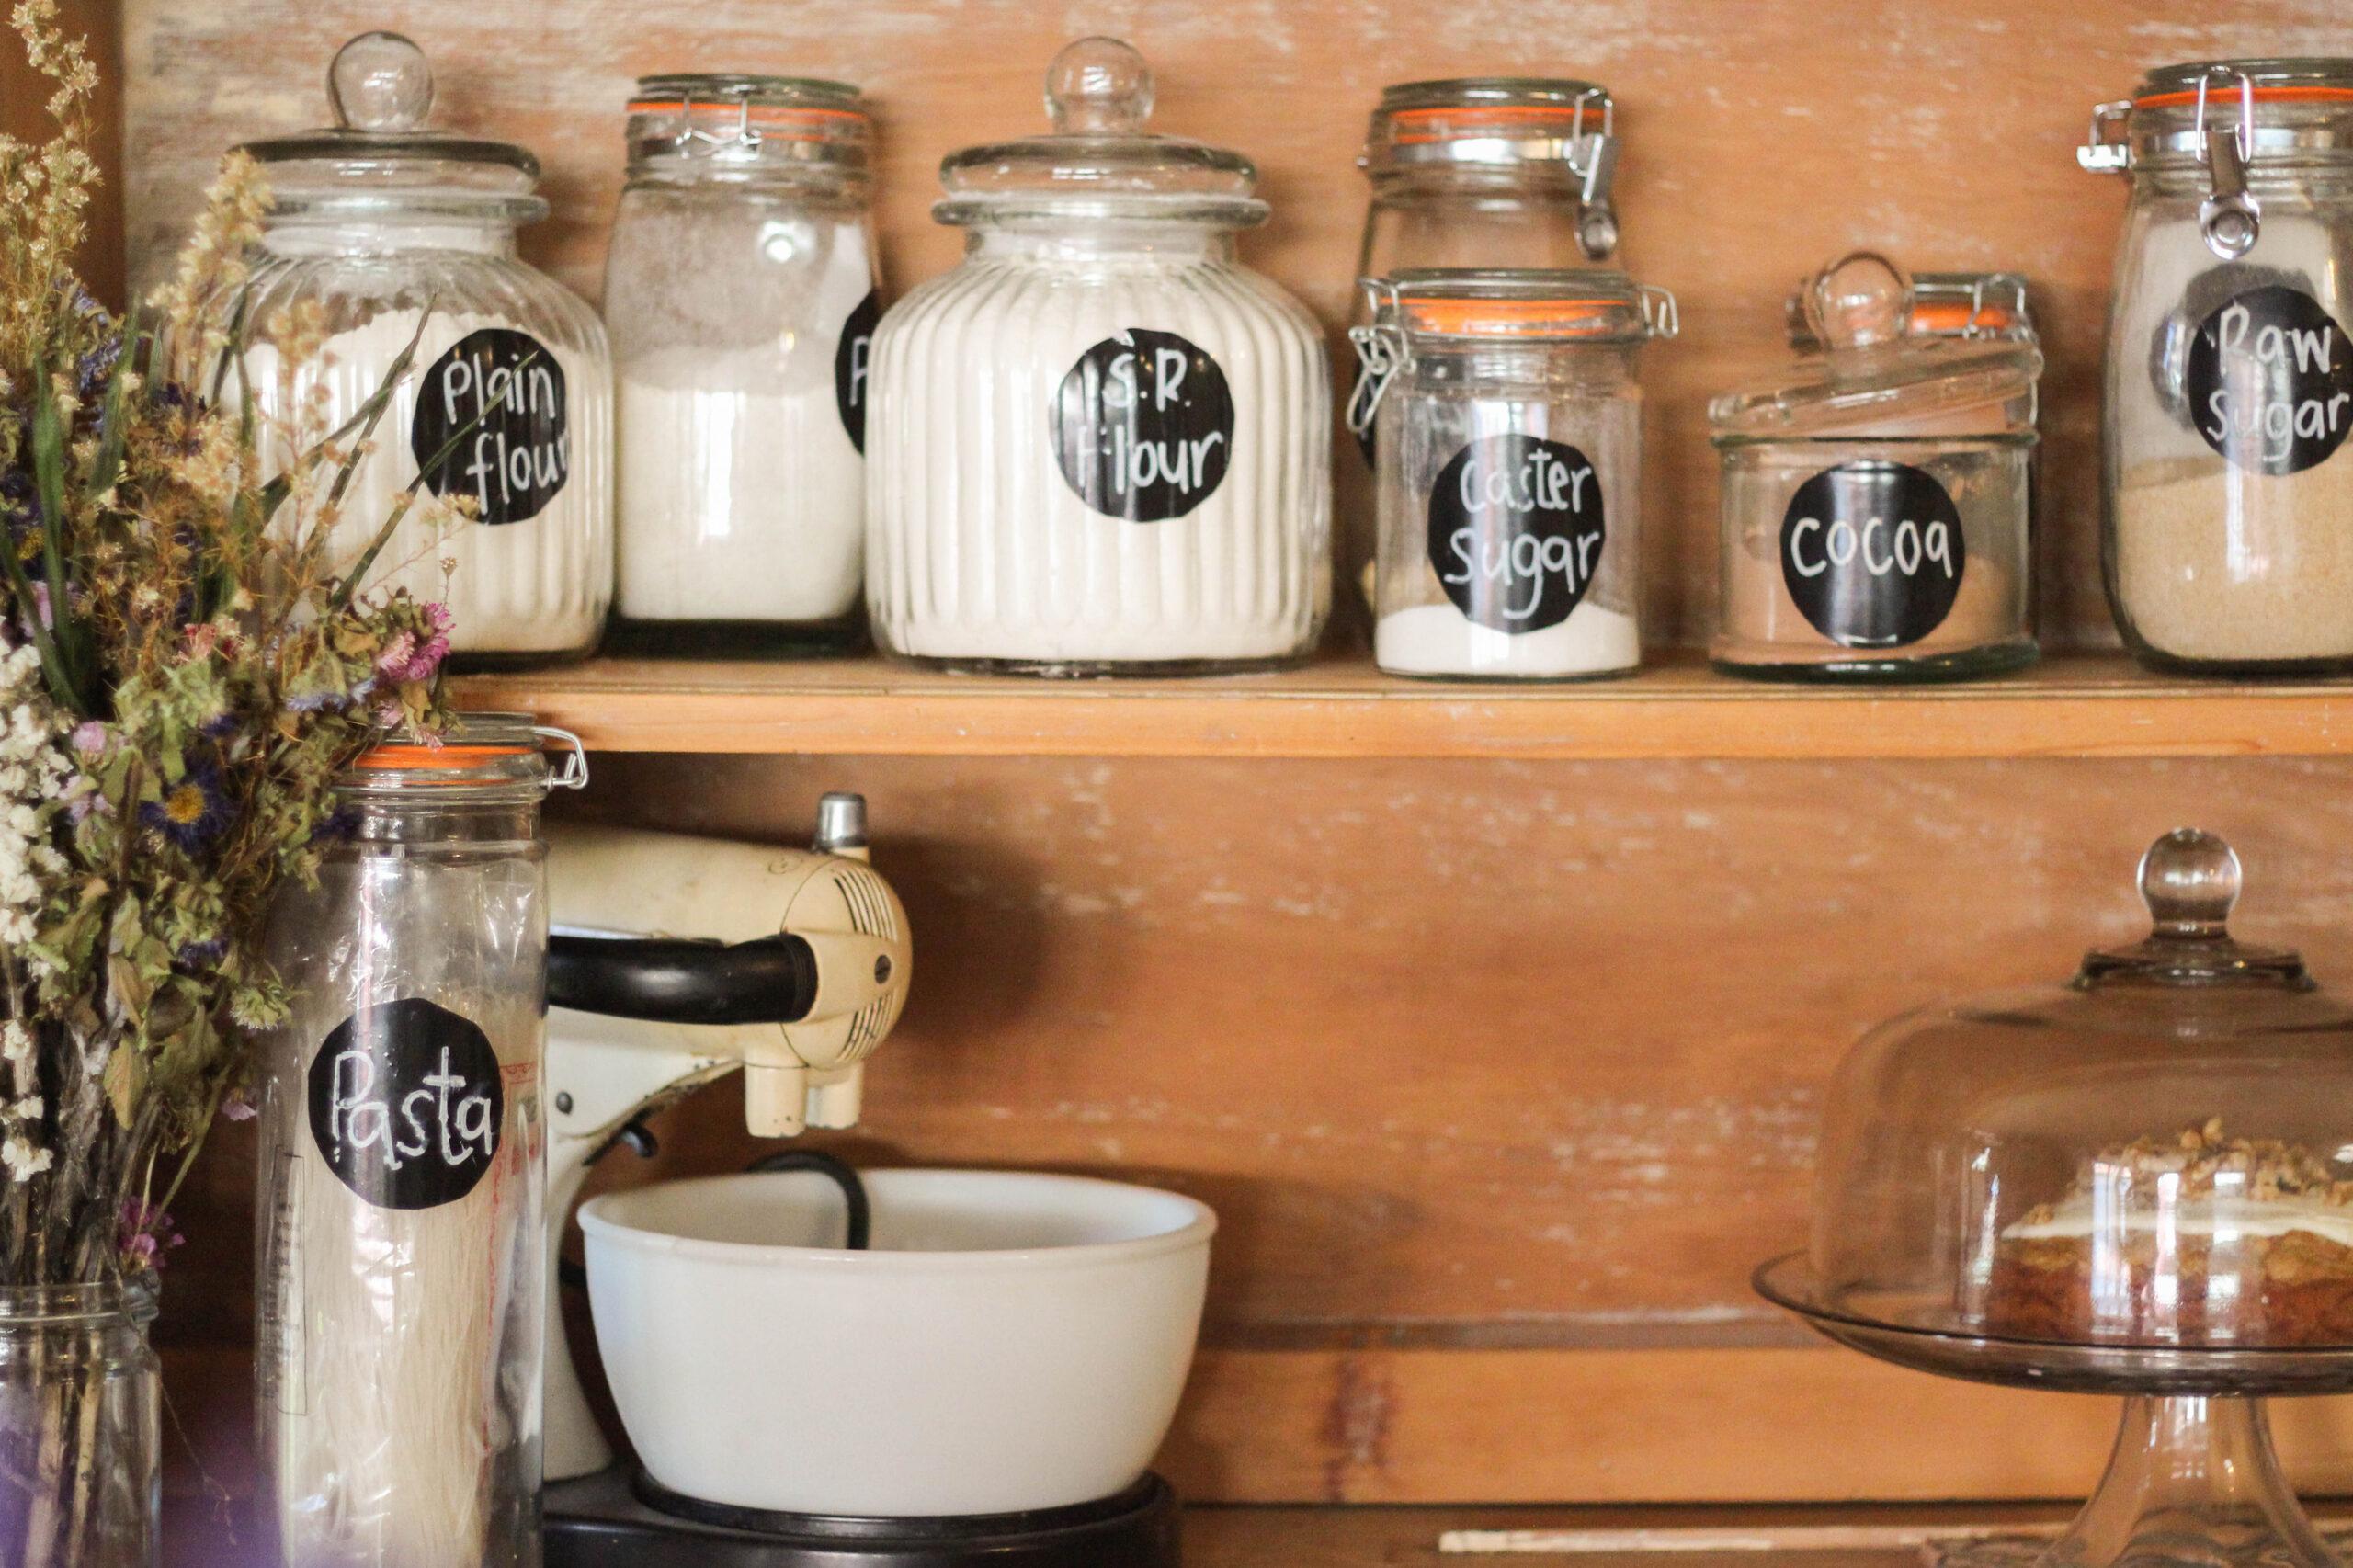 Kitchen pantry organization ideas using labels